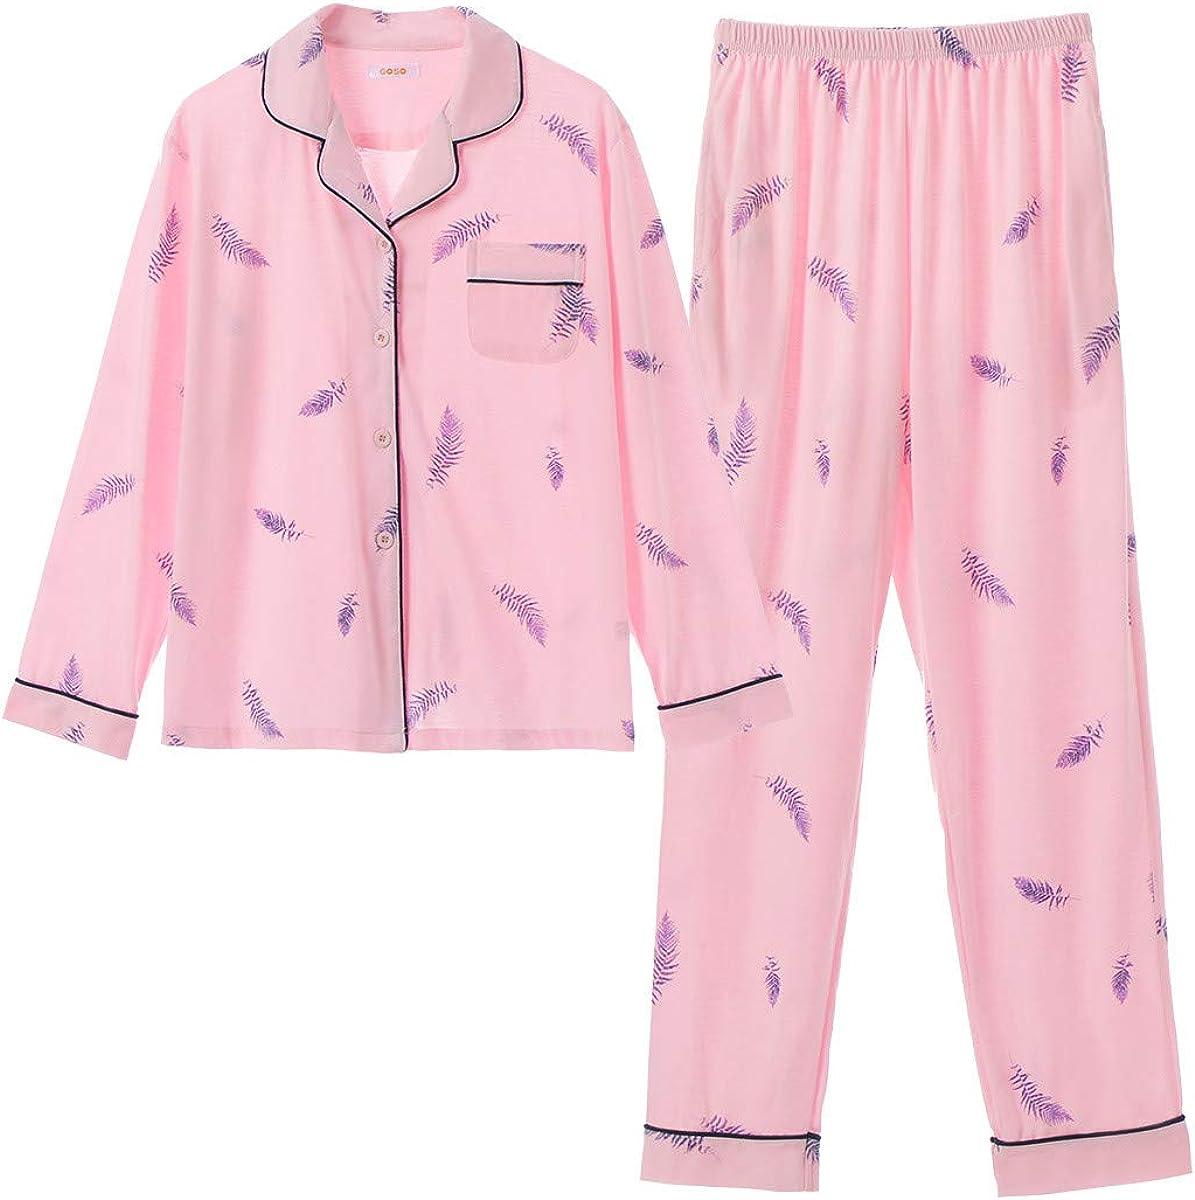 GOSO Pijama para niñas de 8 a 14 años, Pijama con Botones para Adolescentes, niñas, Pijamas de Manga Larga y Pantalones Largos